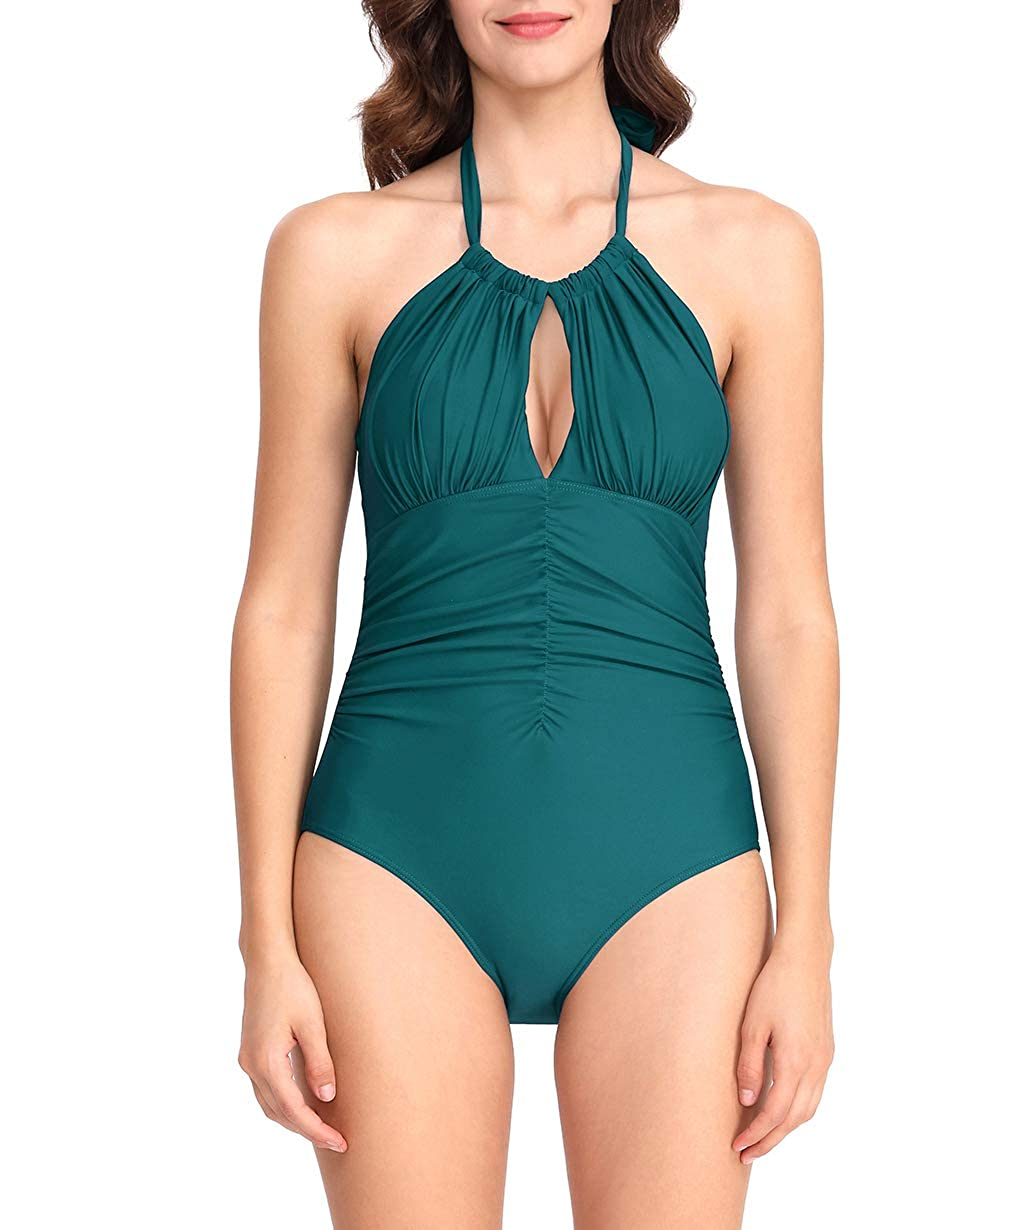 HSwim Womens Elegant Halter Frilled Keyhole High Leg One Piece Swimsuit